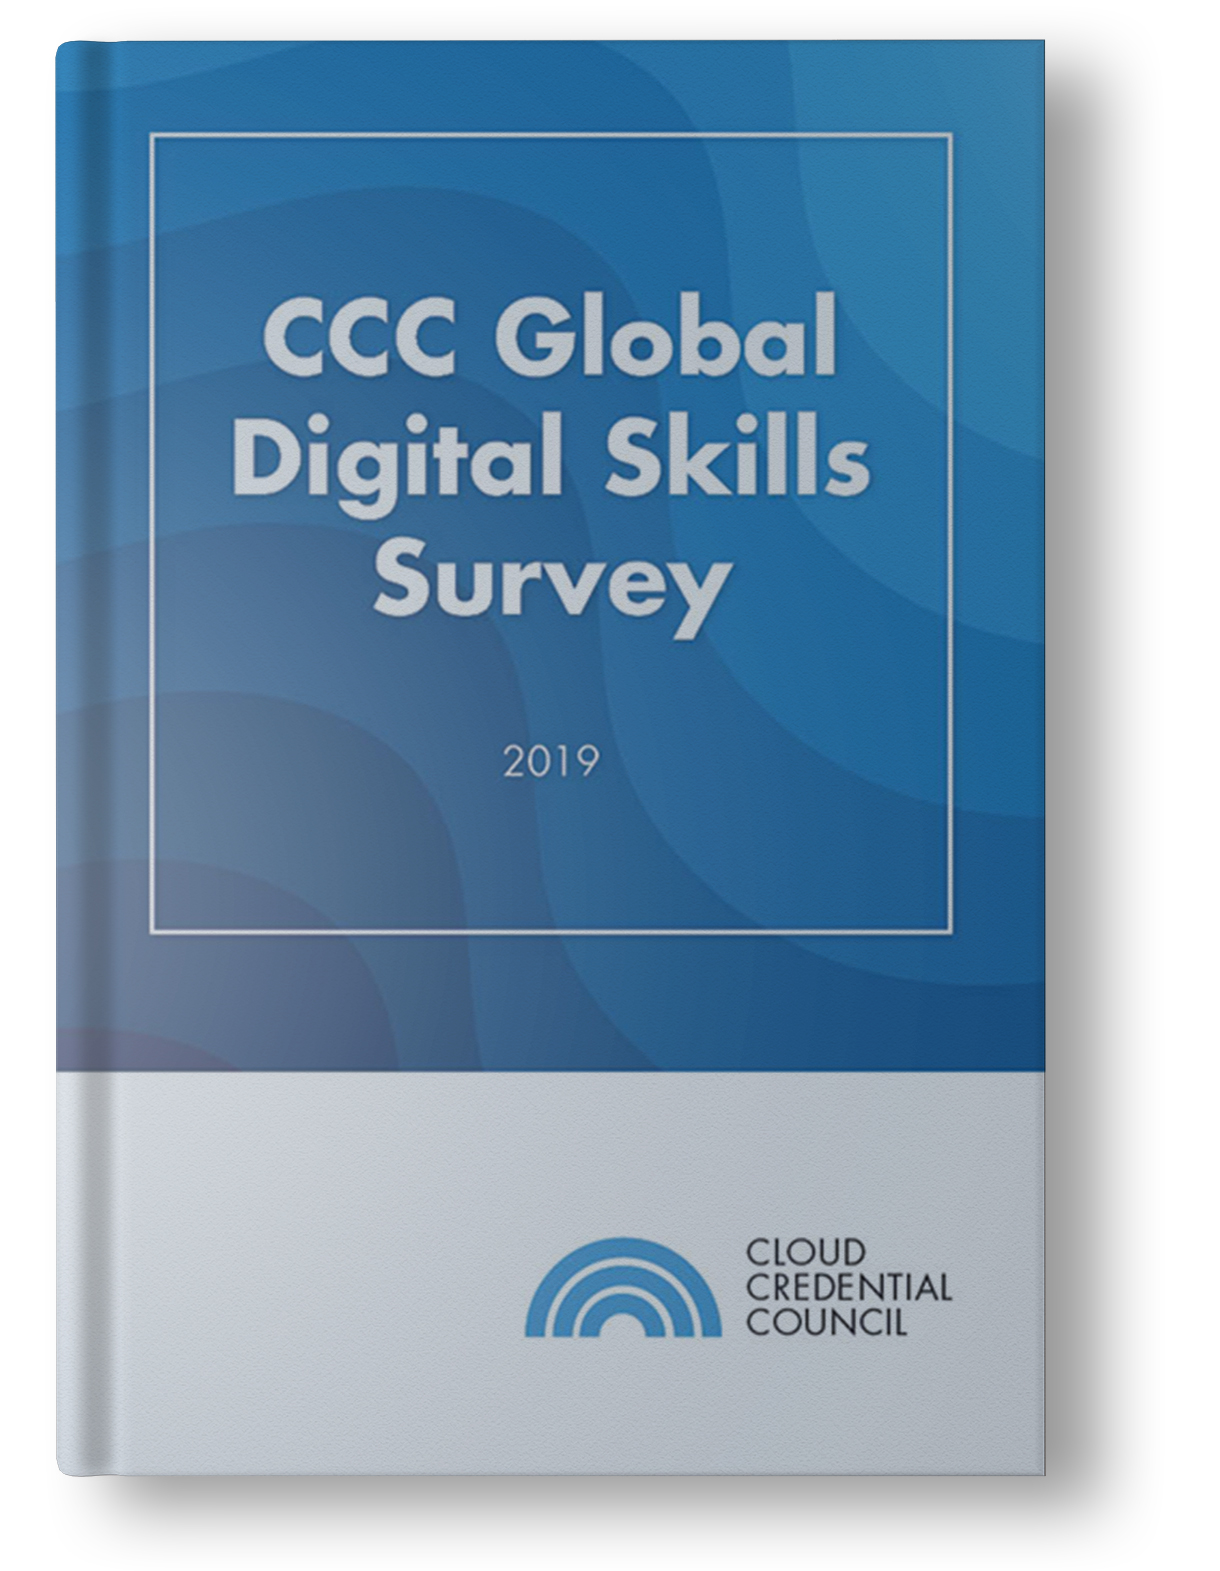 Digital-Skills-Survey-2019-Report-Mockup